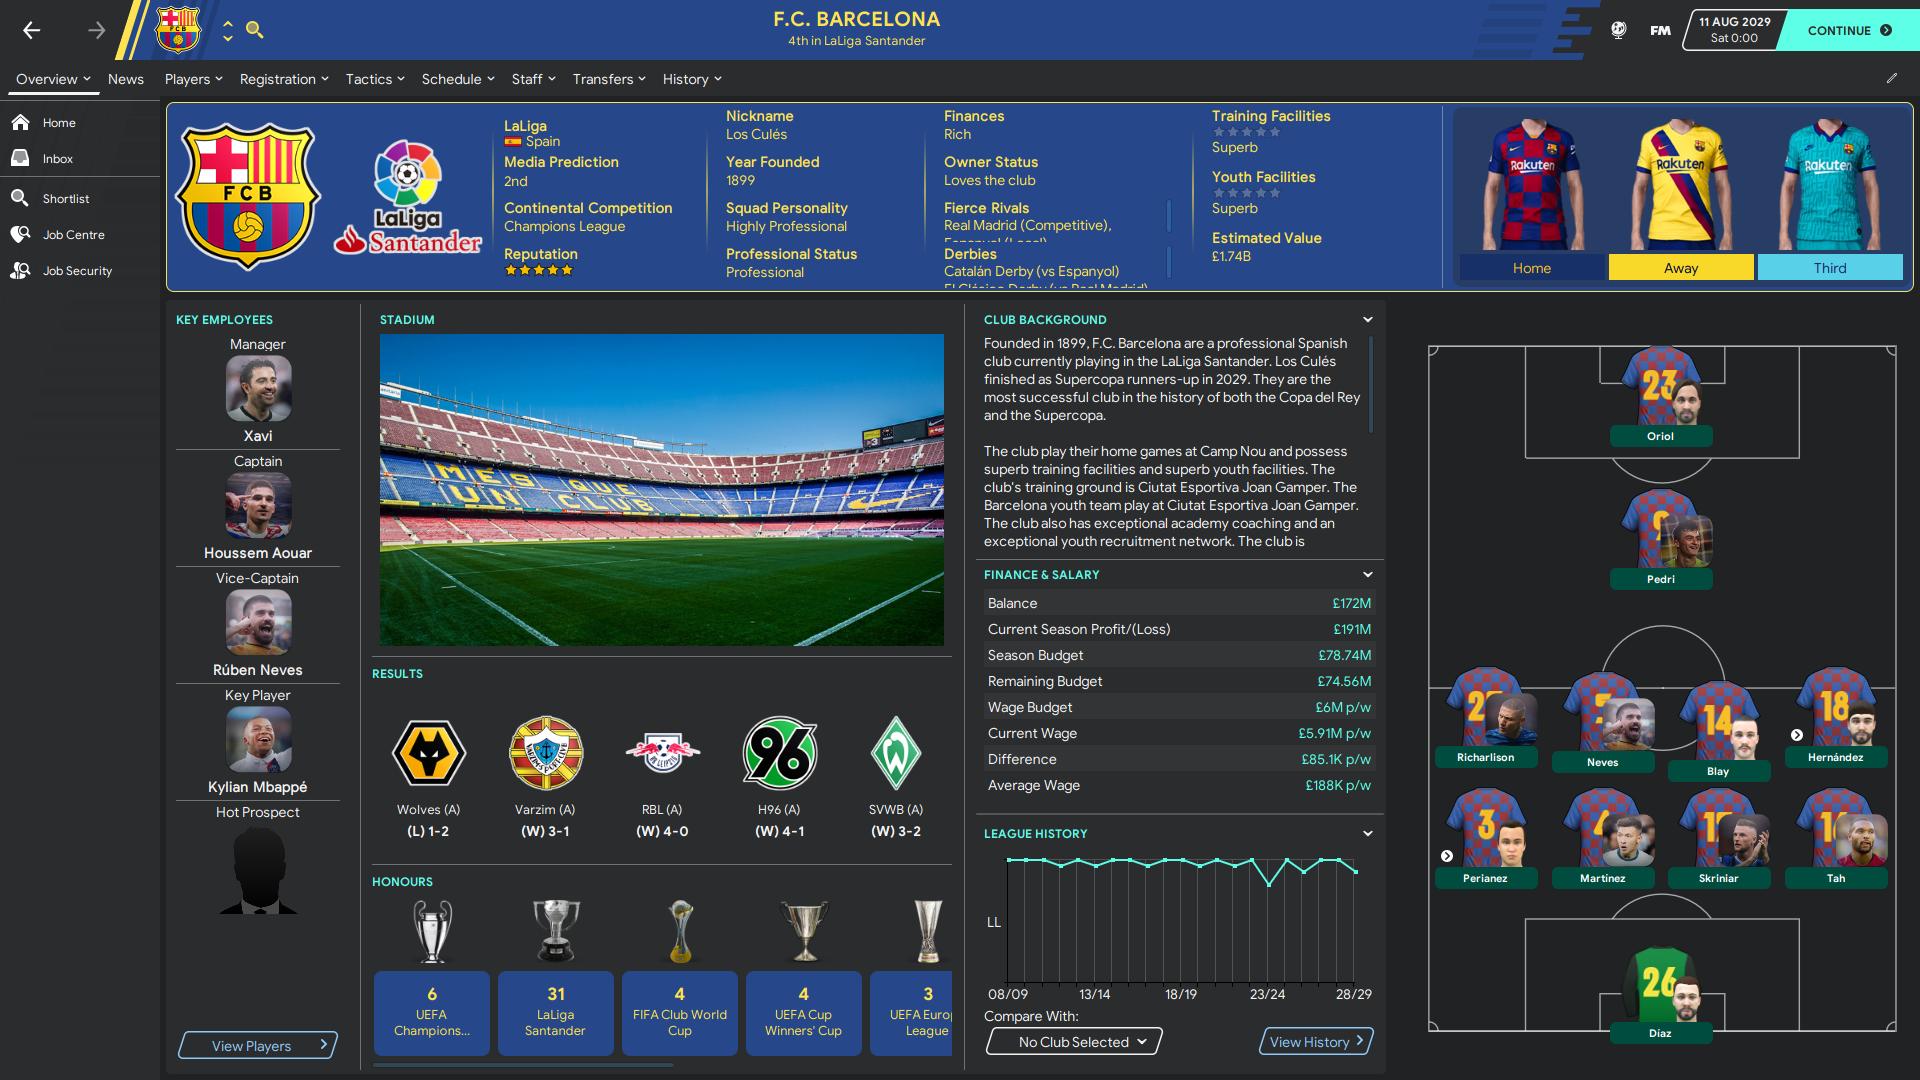 F.C. Barcelona_ Profile.png